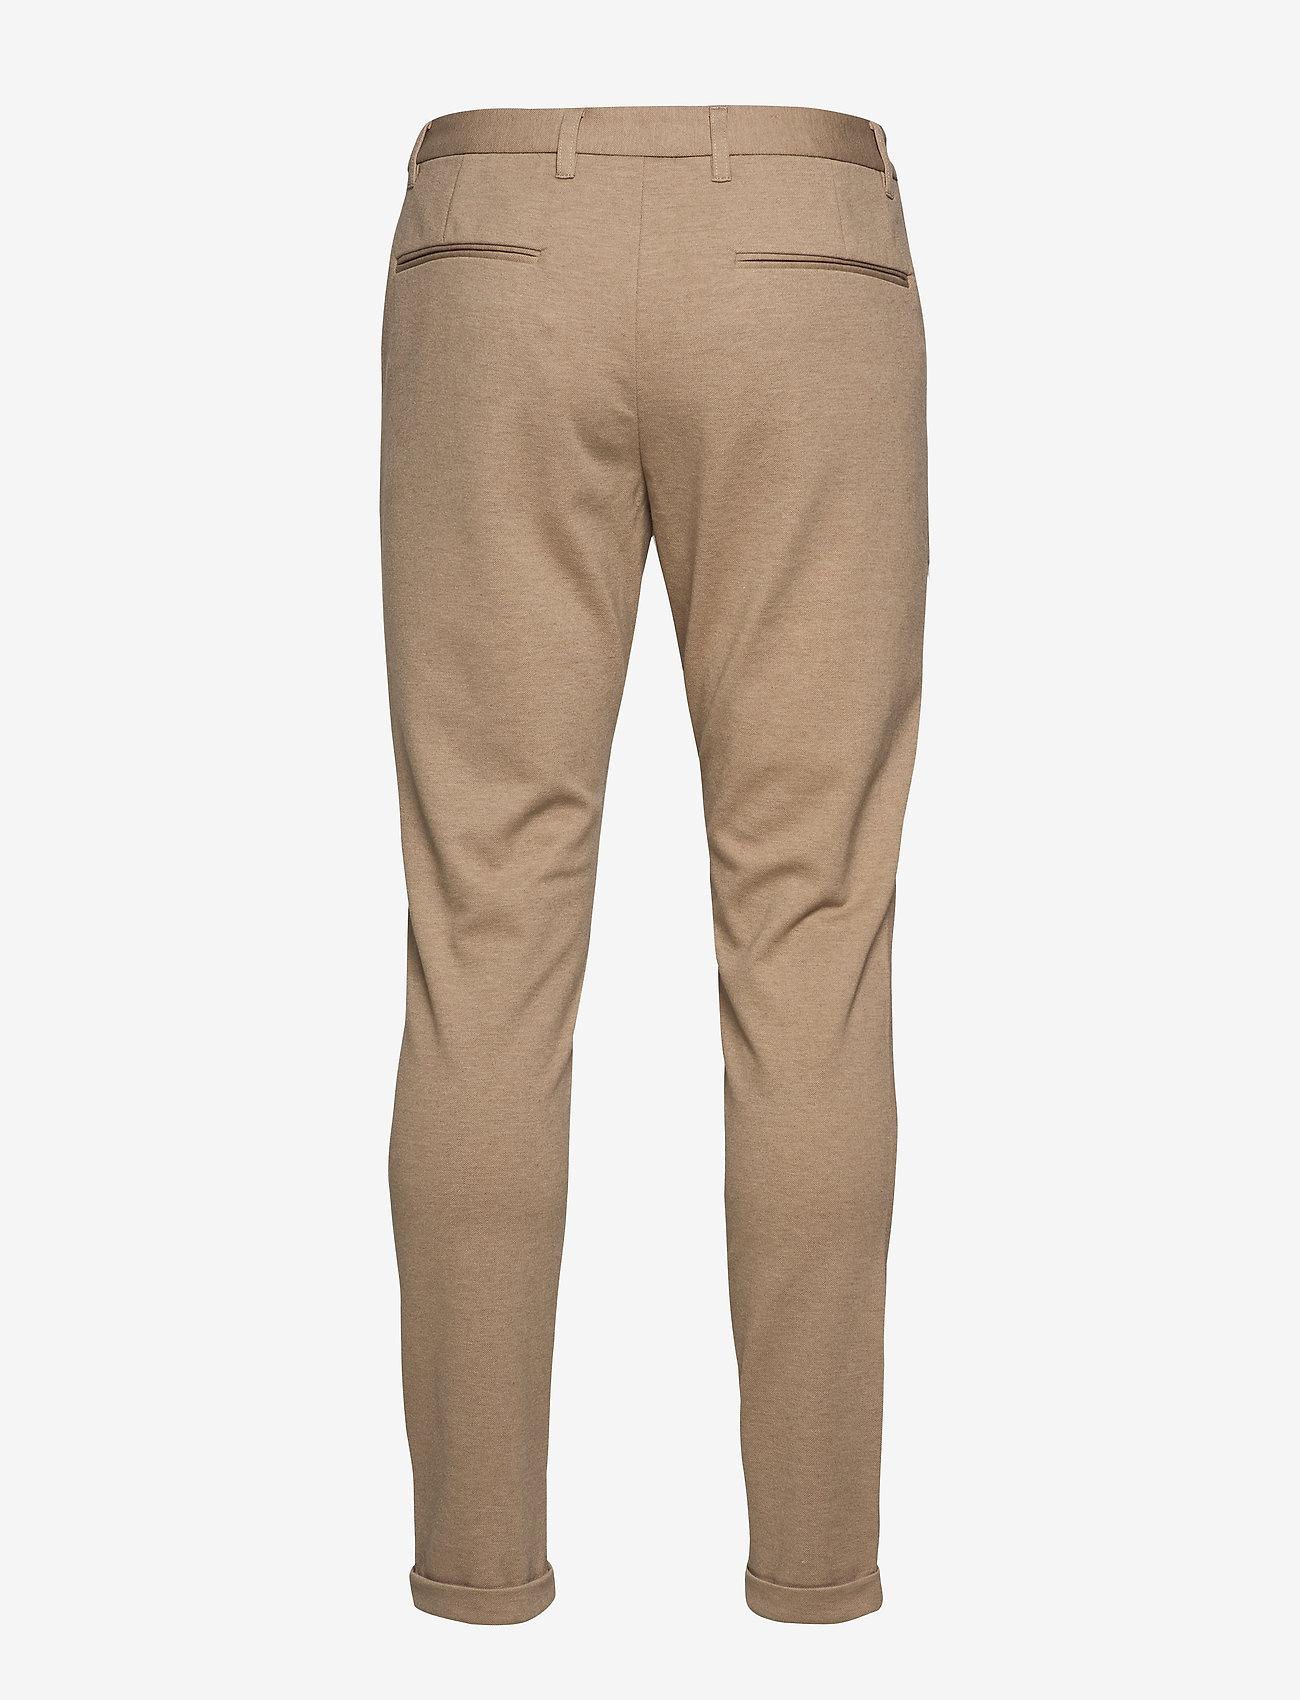 Lindbergh - Knitted pants normal length - spodnie na co dzień - lt sand mix - 1